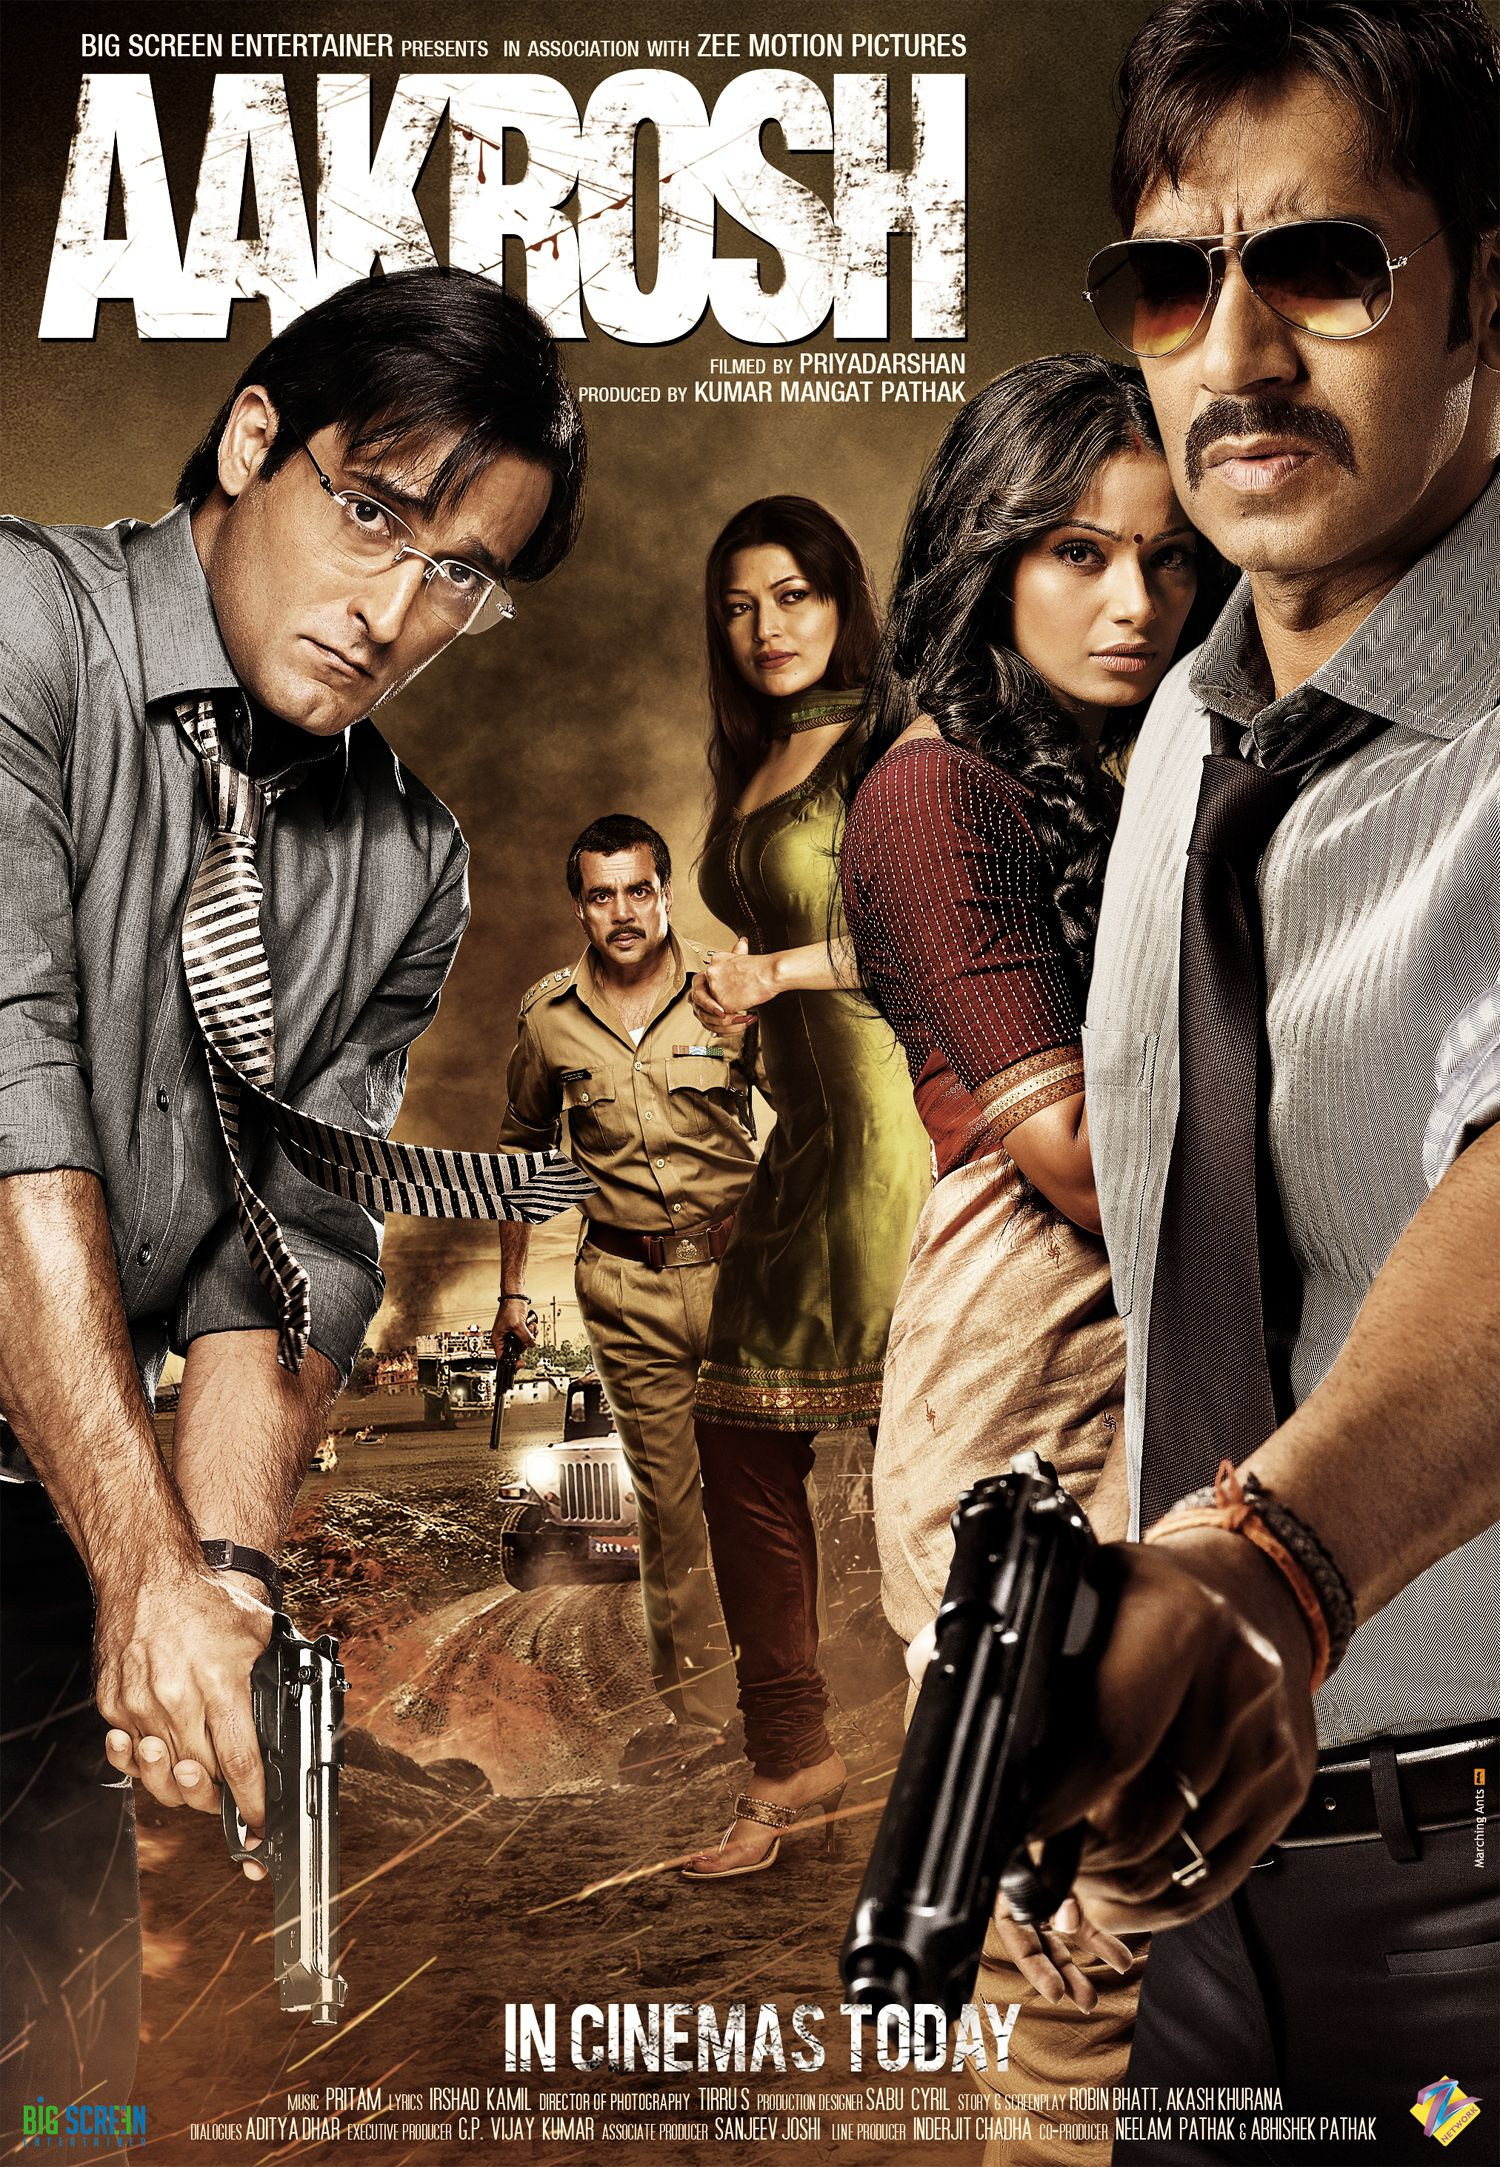 2010 bollywood hits movies list